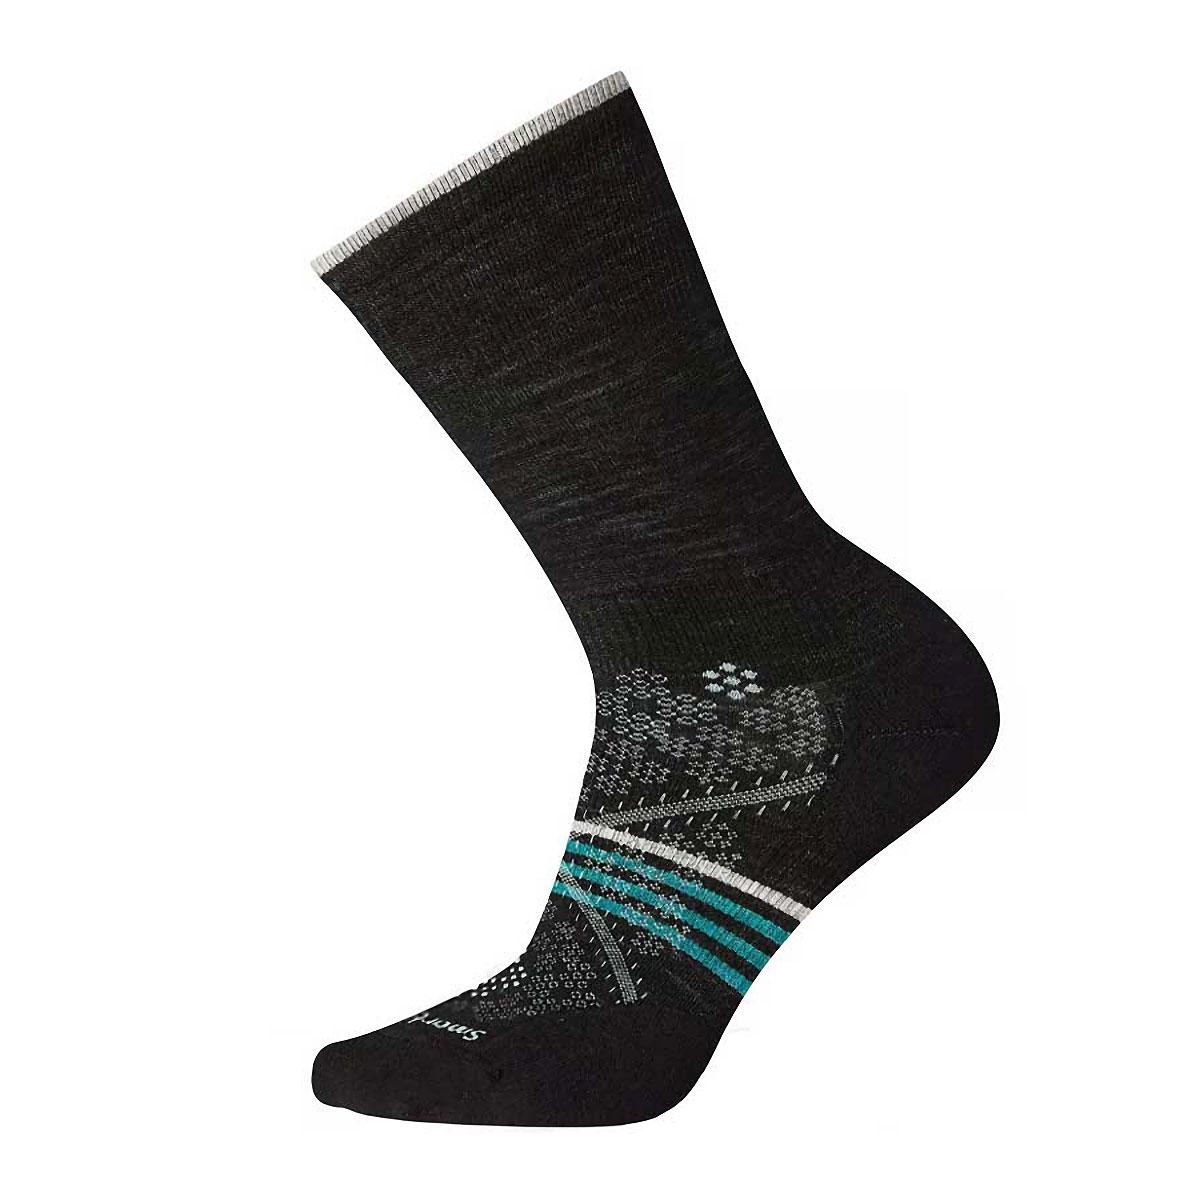 Women's Smartwool Women's Smartwool PhD Run Light Elite Crew Socks  - Color: Black - Size: S, Black, large, image 1